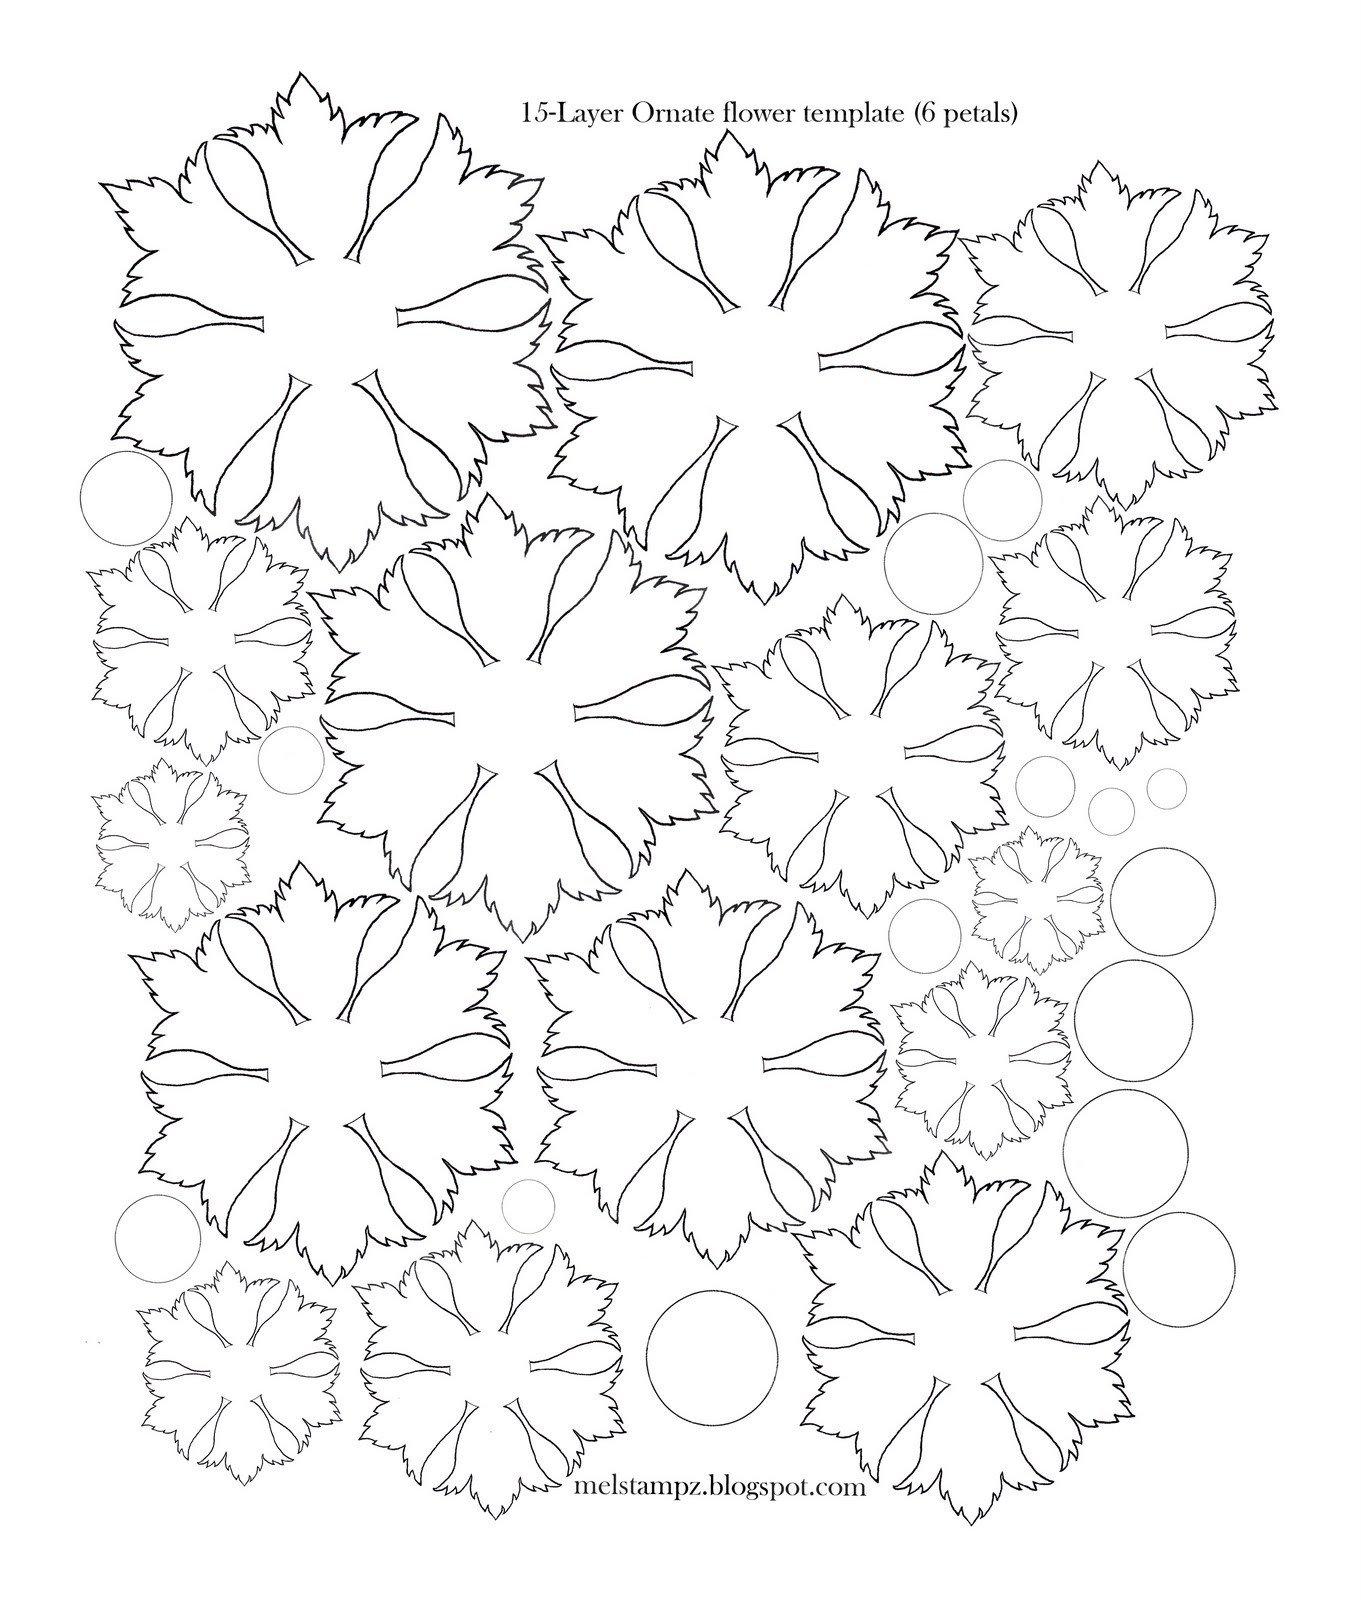 Paper Flower Petal Templates Mel Stampz 6 Petal ornate Flower Template